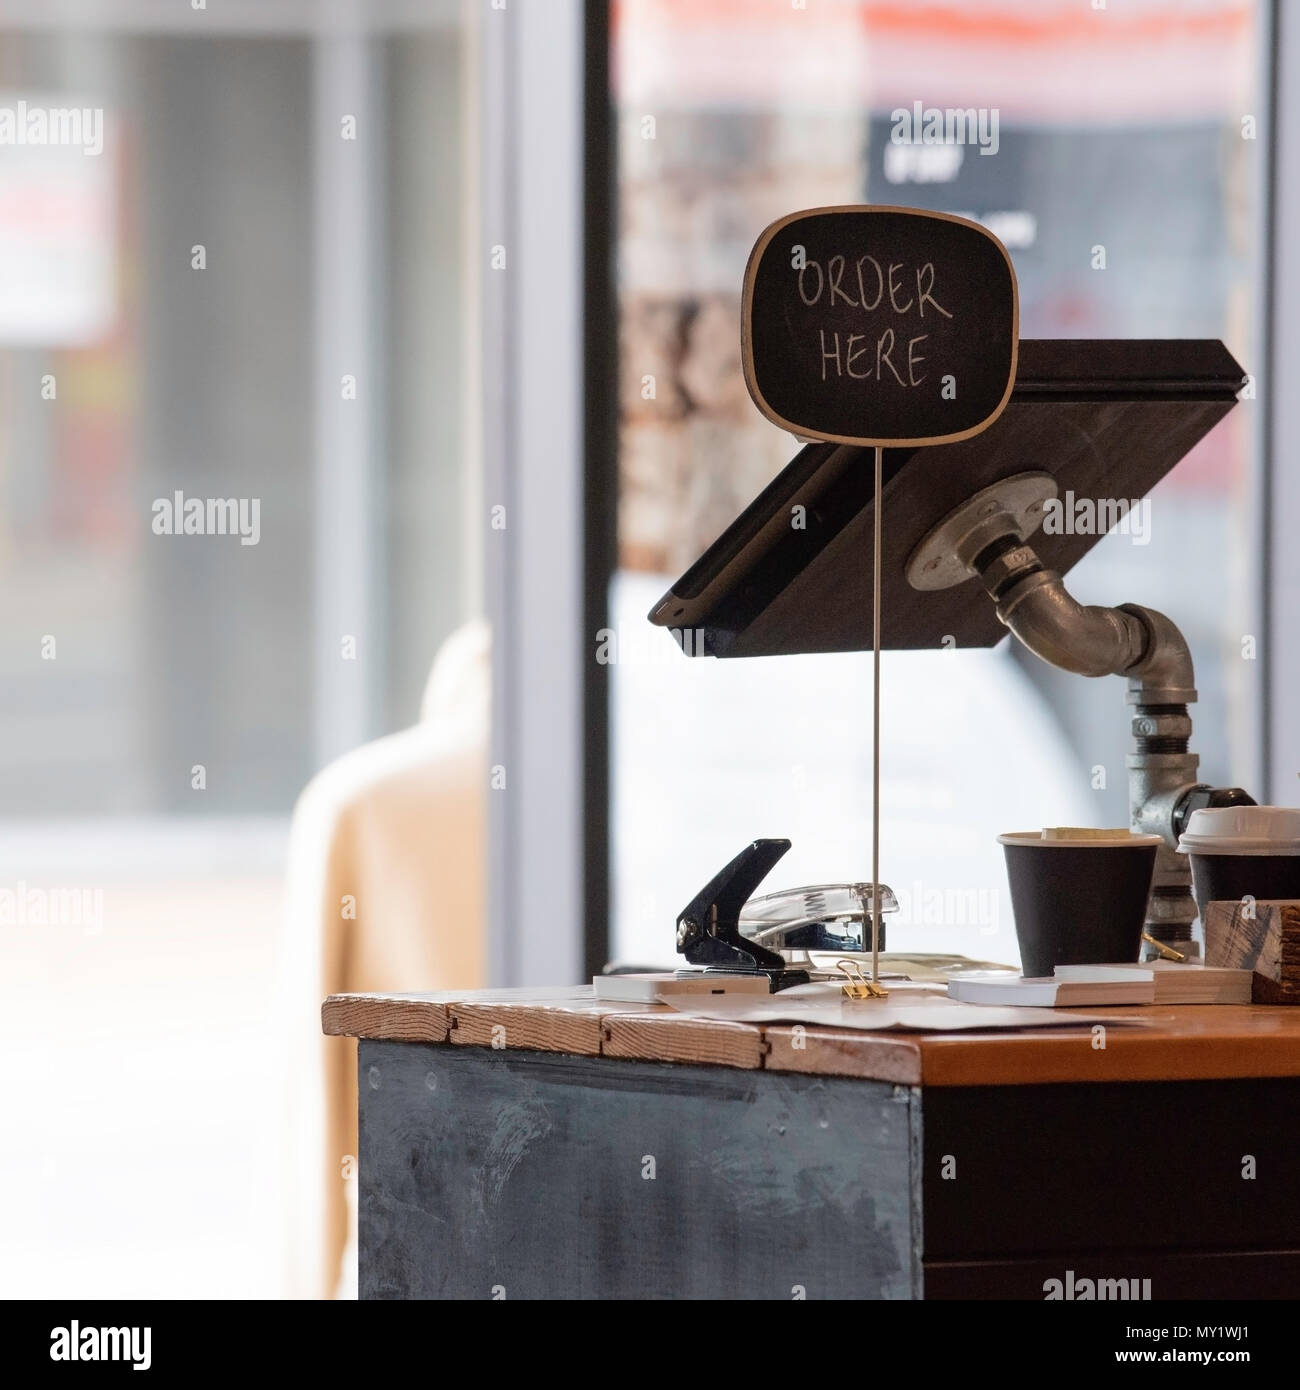 Contemporary Cappuccino Connect It Computer: Order Here Sign Stock Photos & Order Here Sign Stock